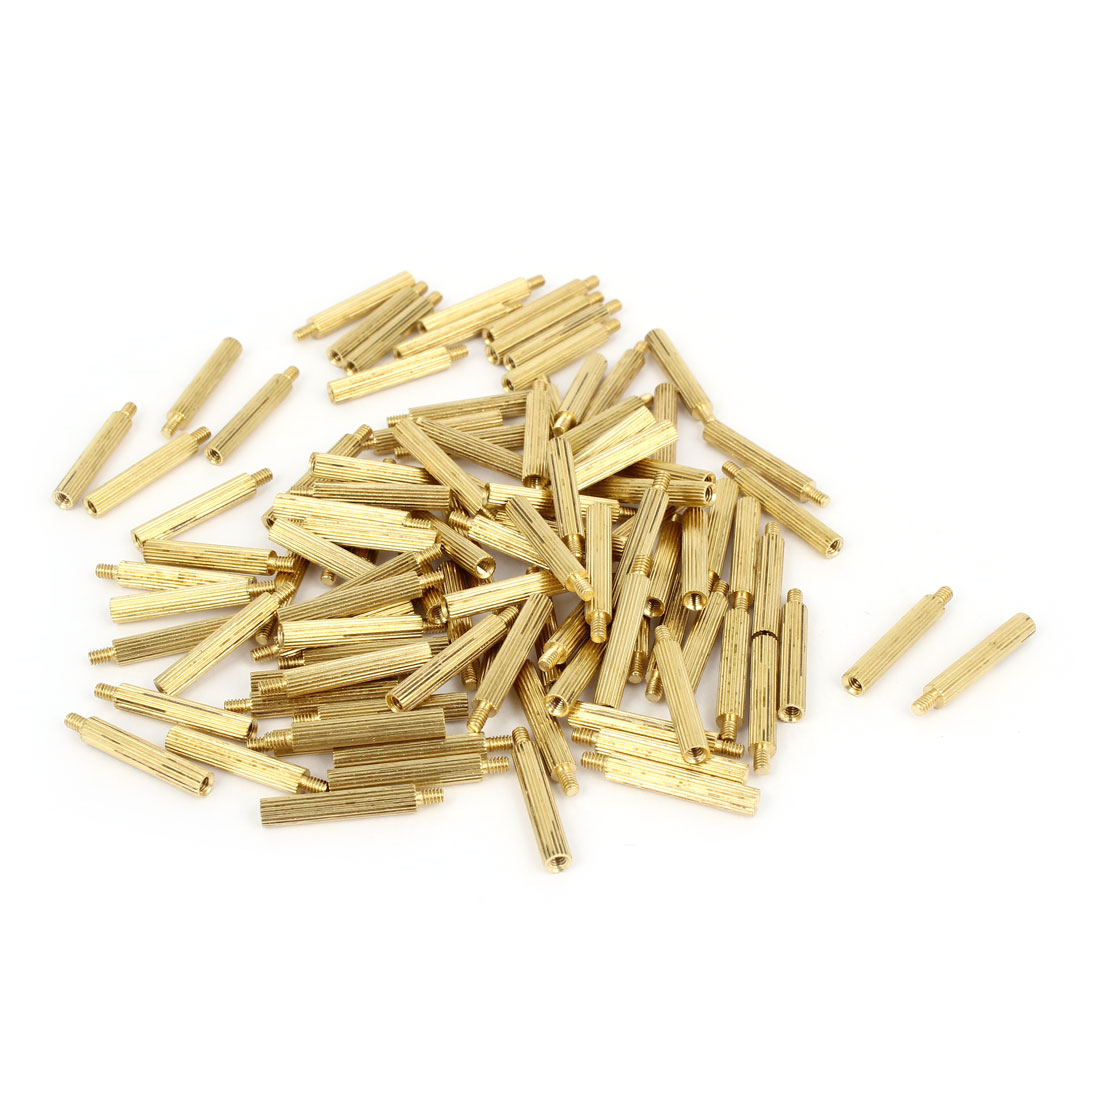 100 Pcs Male to Female Screw Brass Pillars Standoff Spacer M2x17mmx20mm